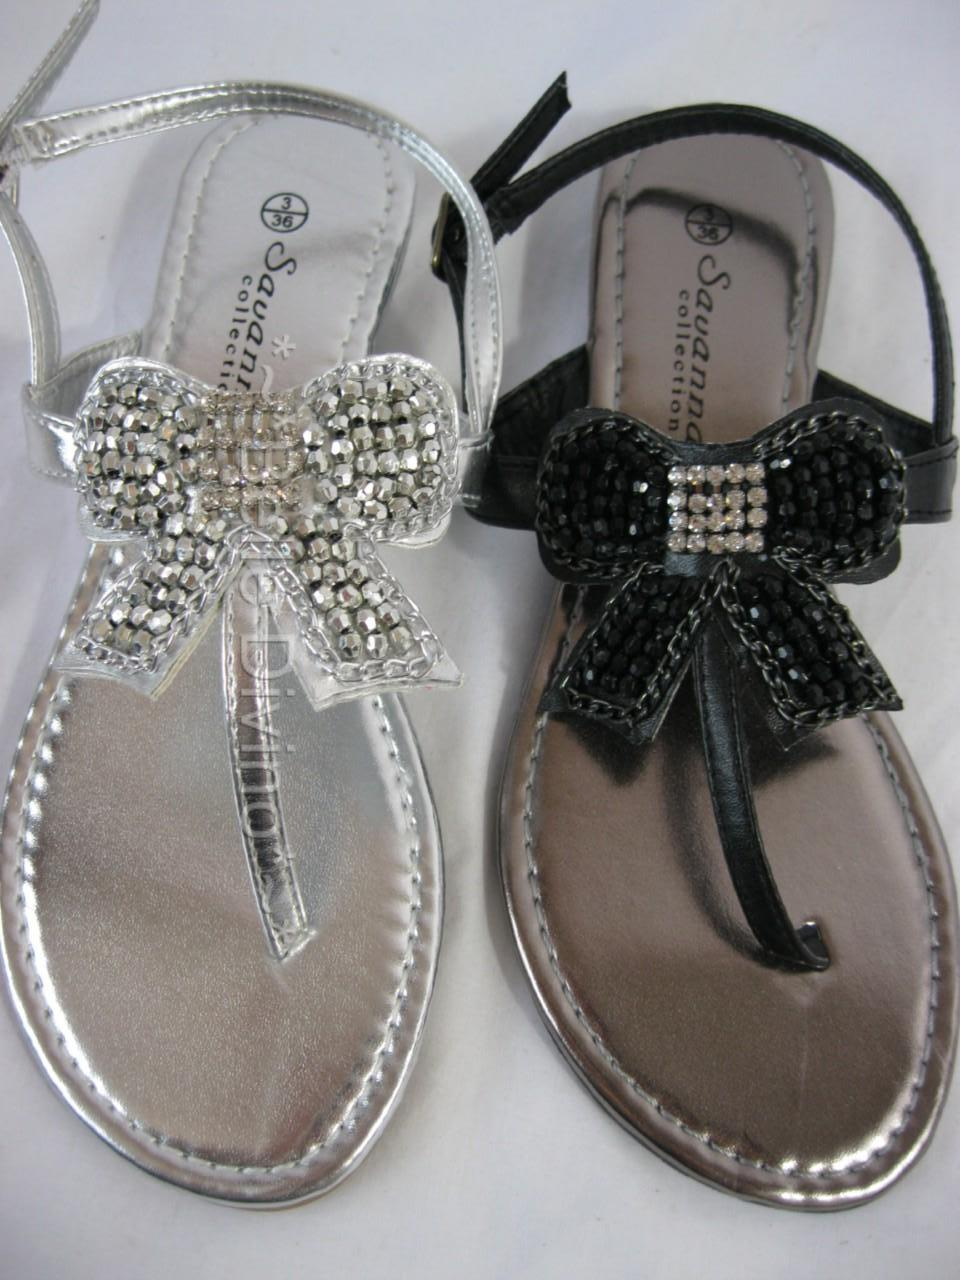 Savannah Diamante Jewel Bow Jewel Leather Flip flops 3 8 ...